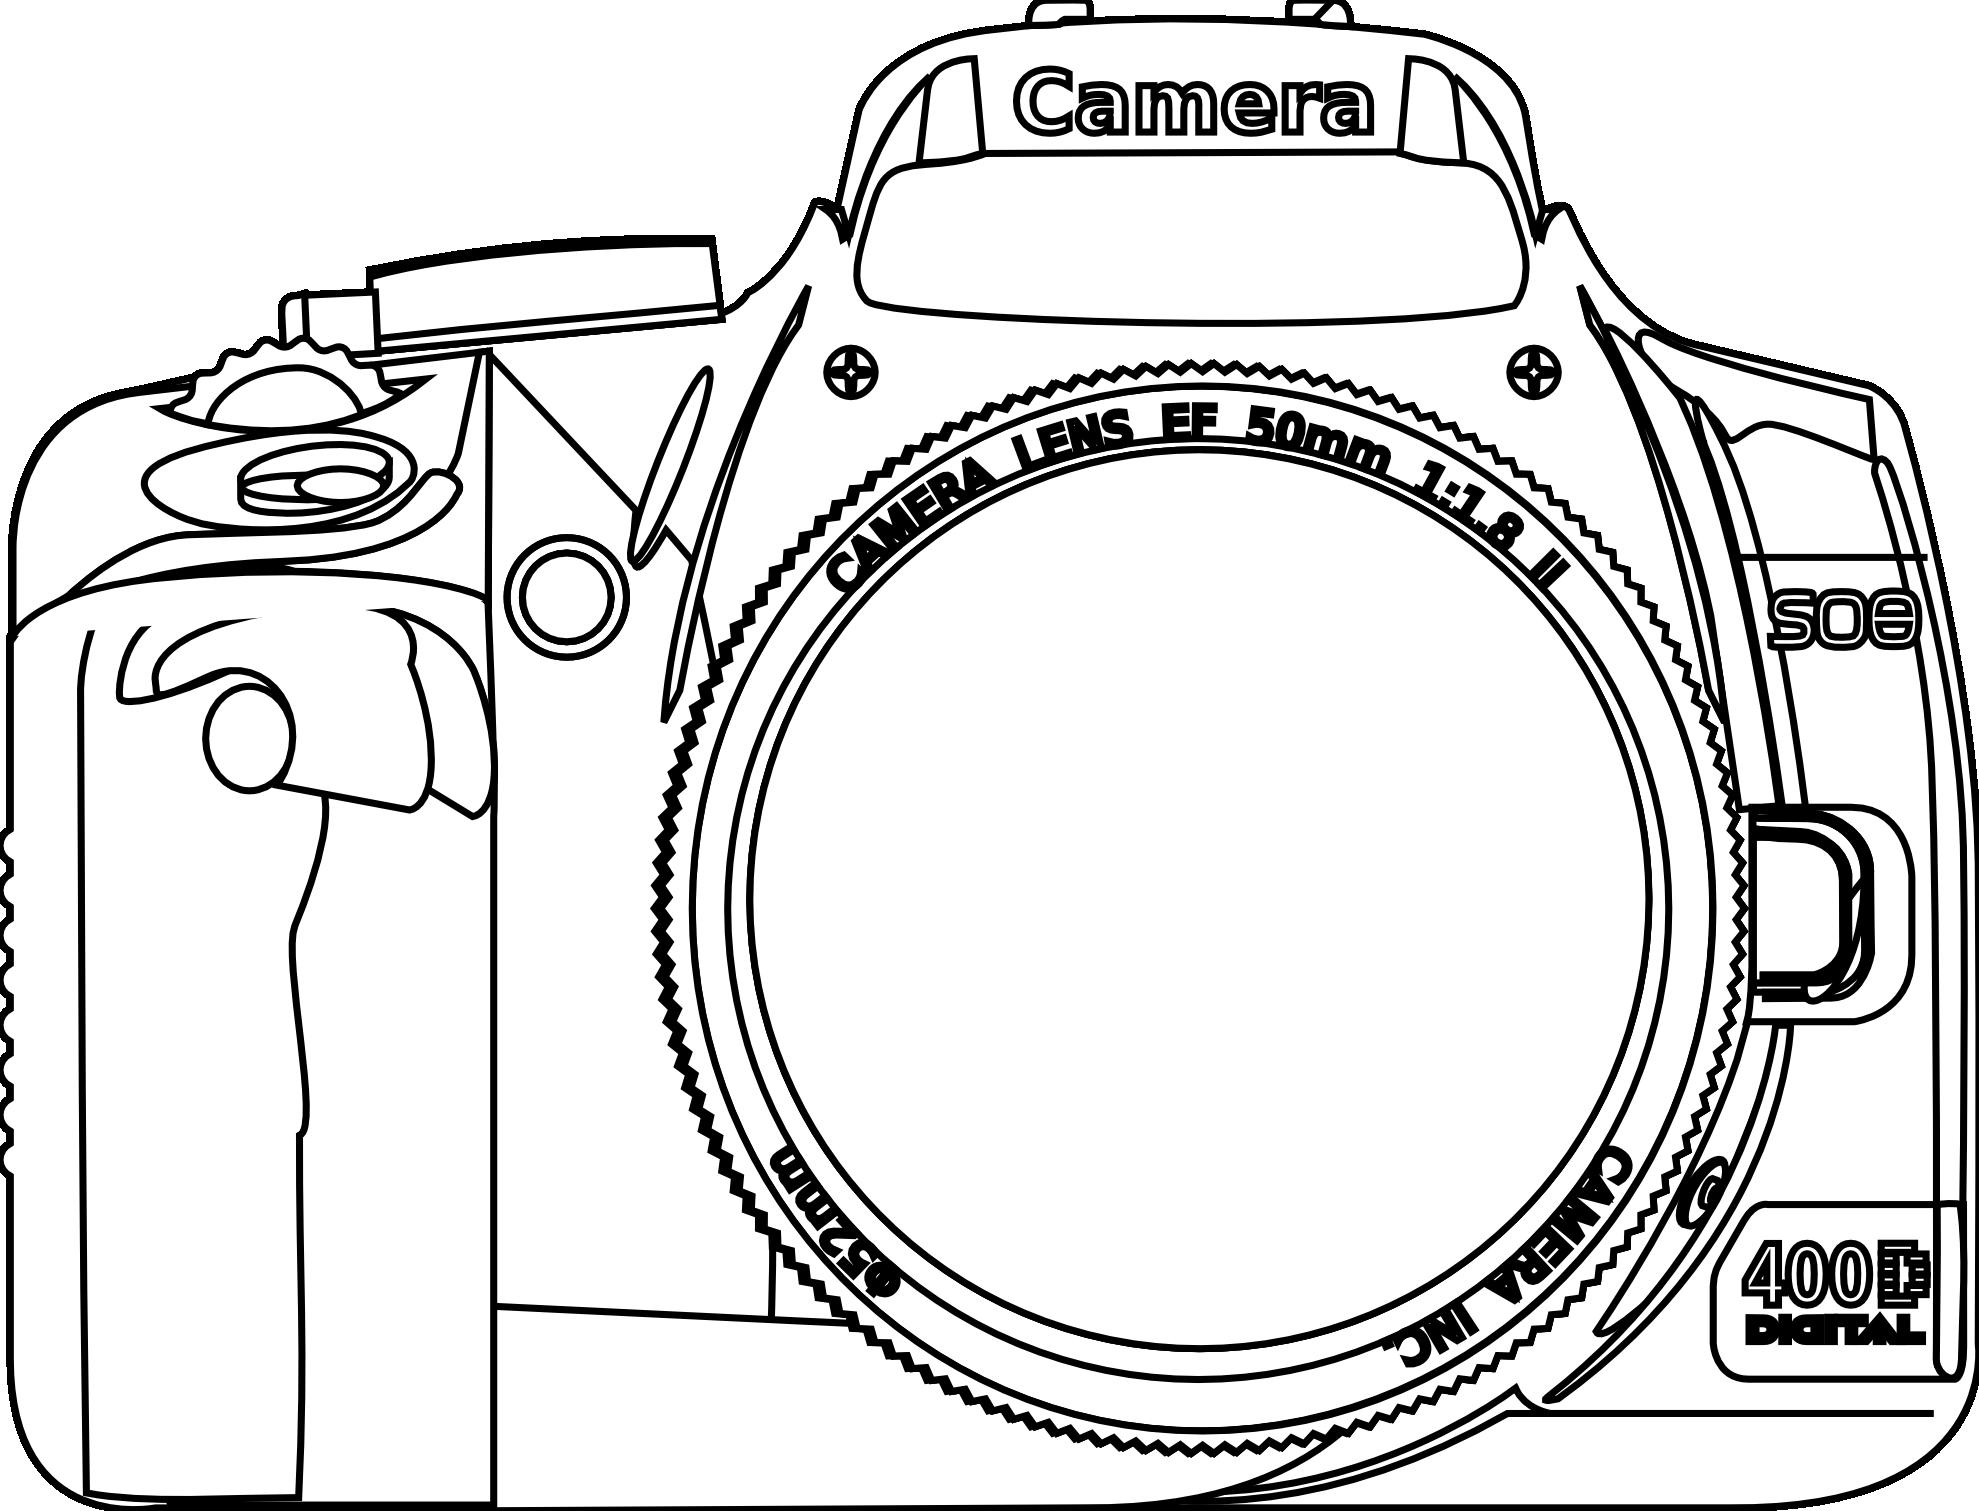 Nikon dslr camera pencil. Plane clipart tiger moth